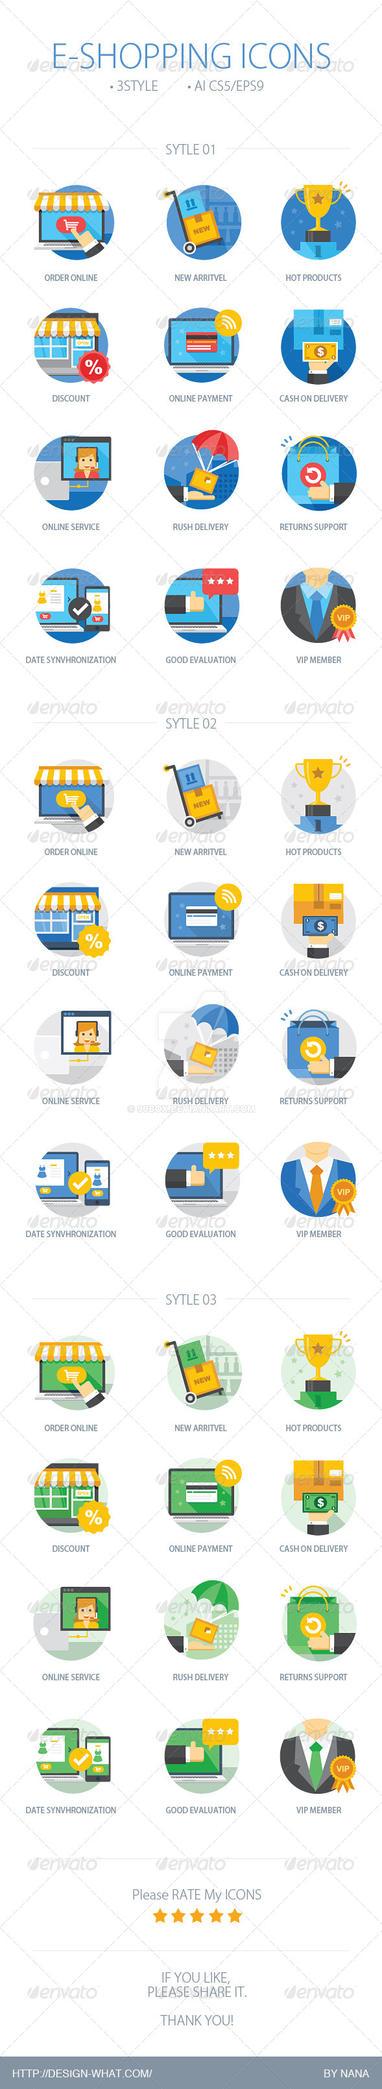 E-Shopping Icons by 90Box